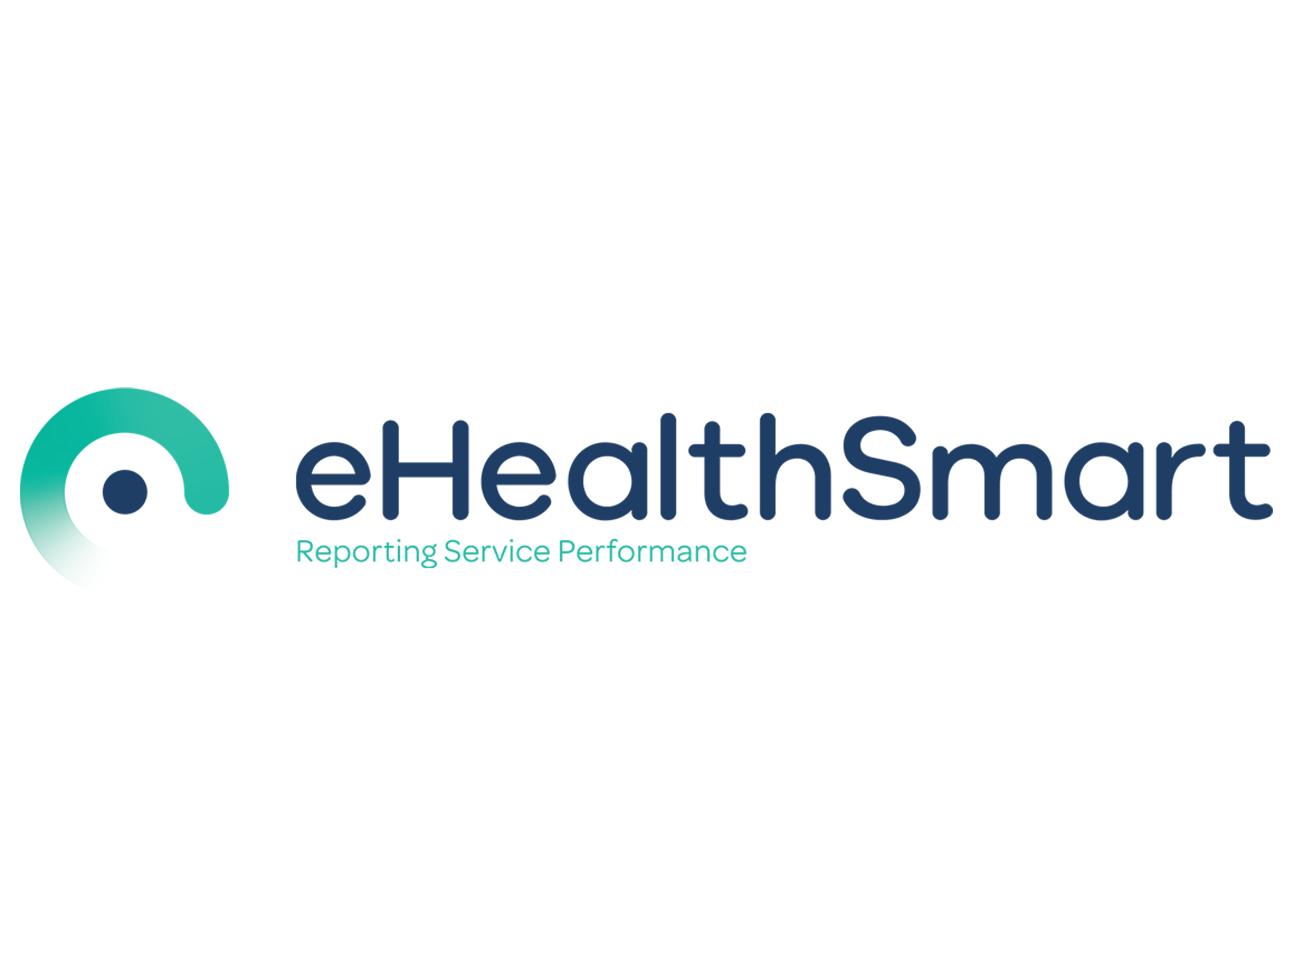 eHealthSmart logo